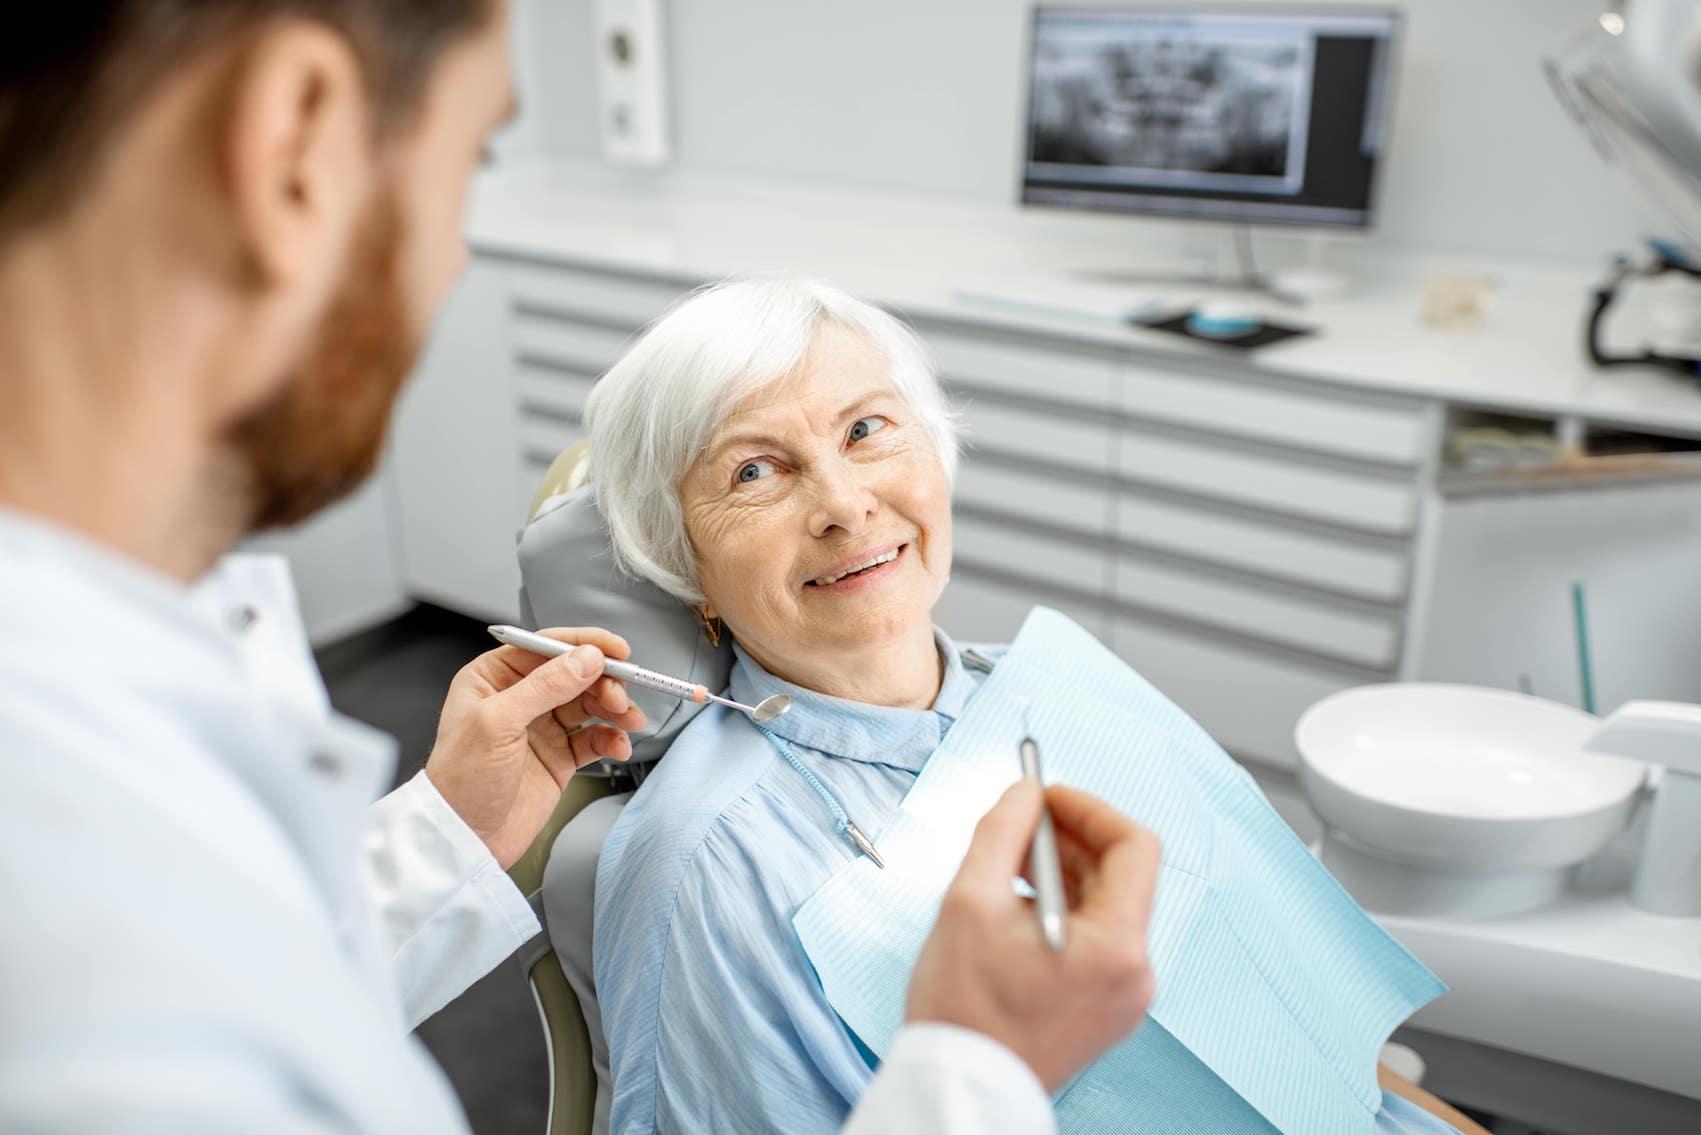 Dentist_checking_old_woman.jpeg